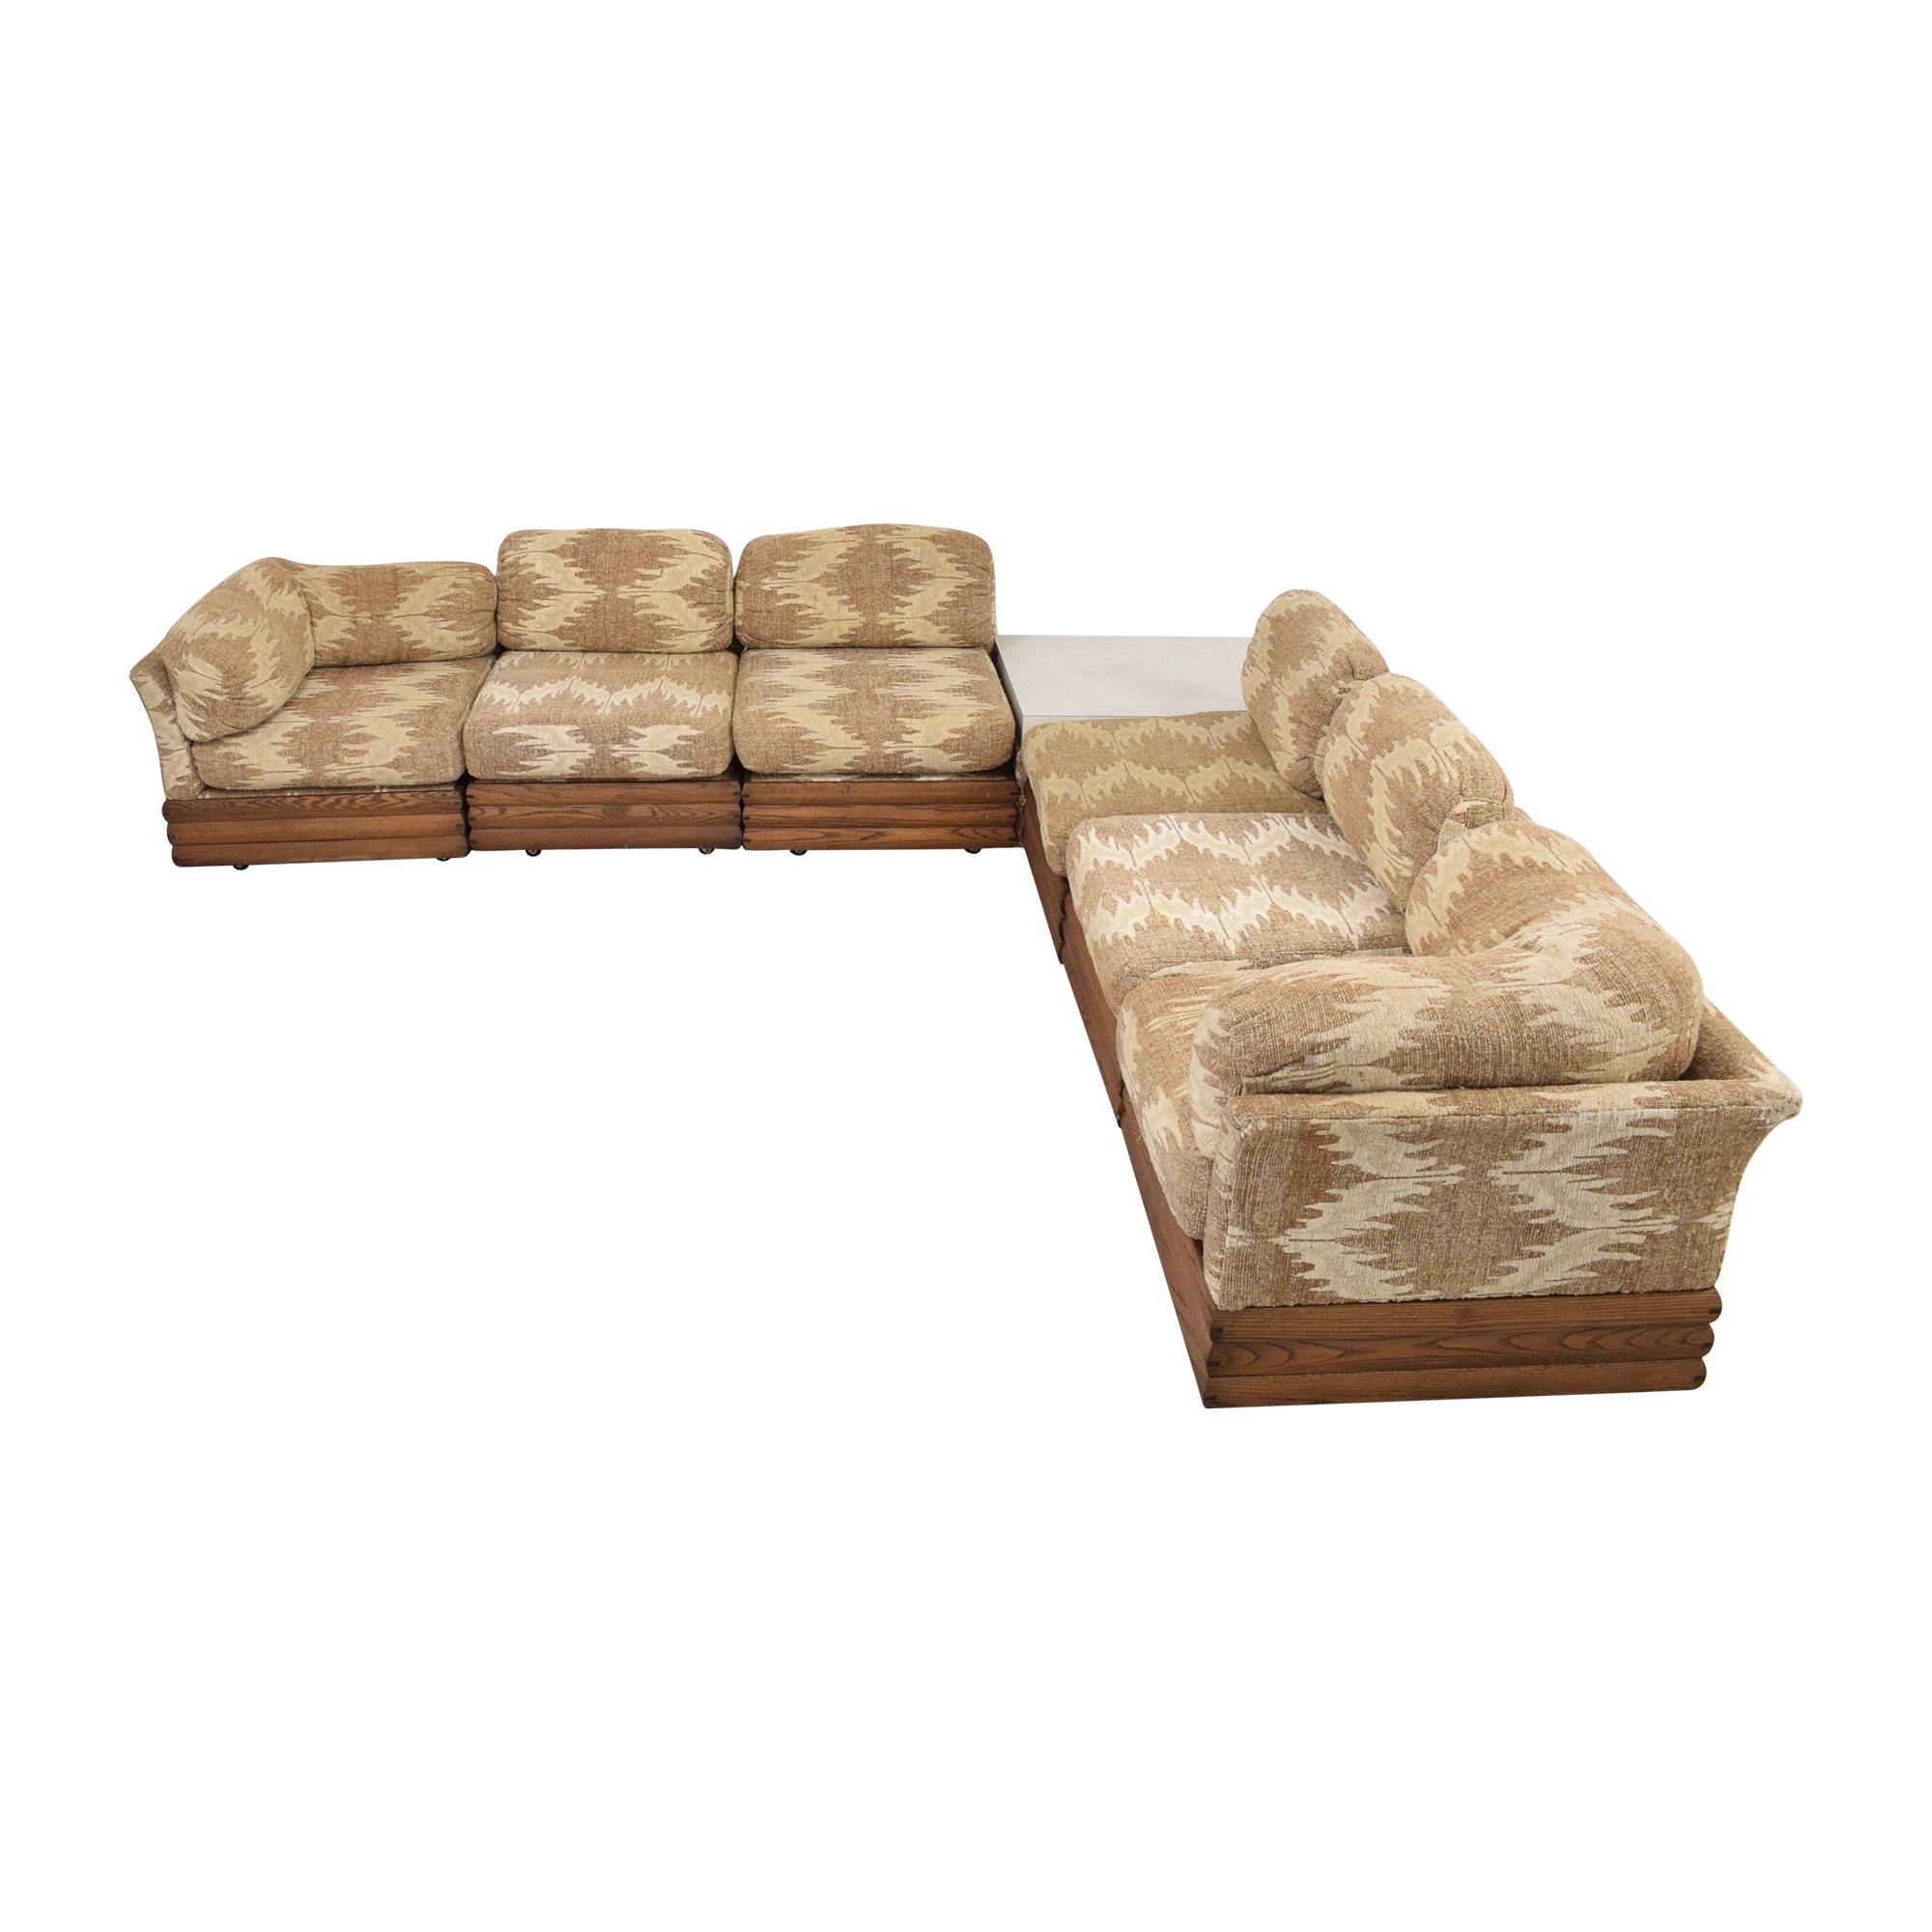 Royal Lounge Royal Lounge Sectional Sofa with Corner Table for sale